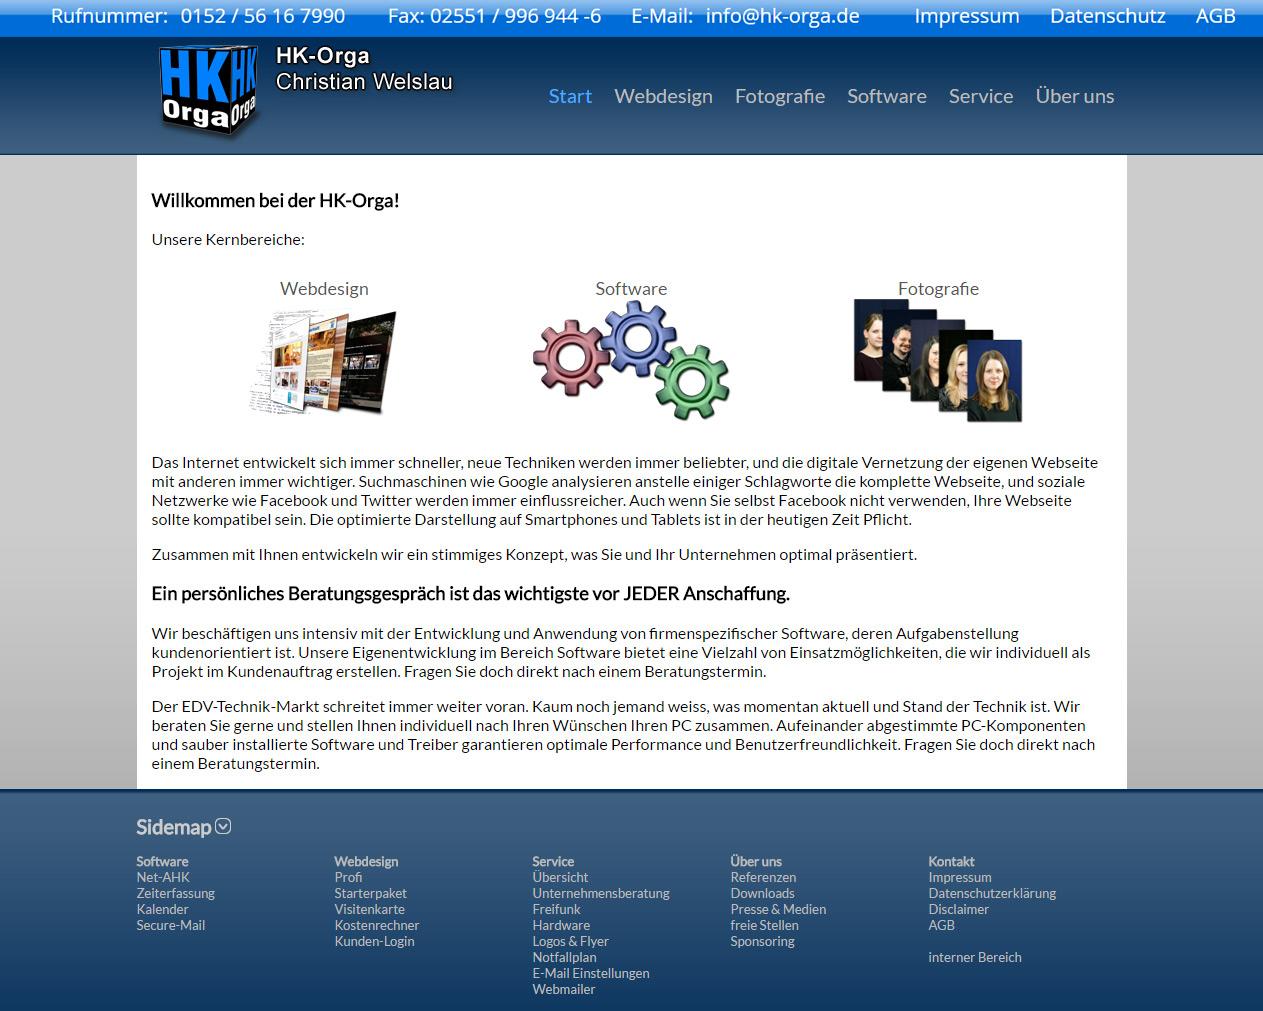 Screenshot HK-Orga.de